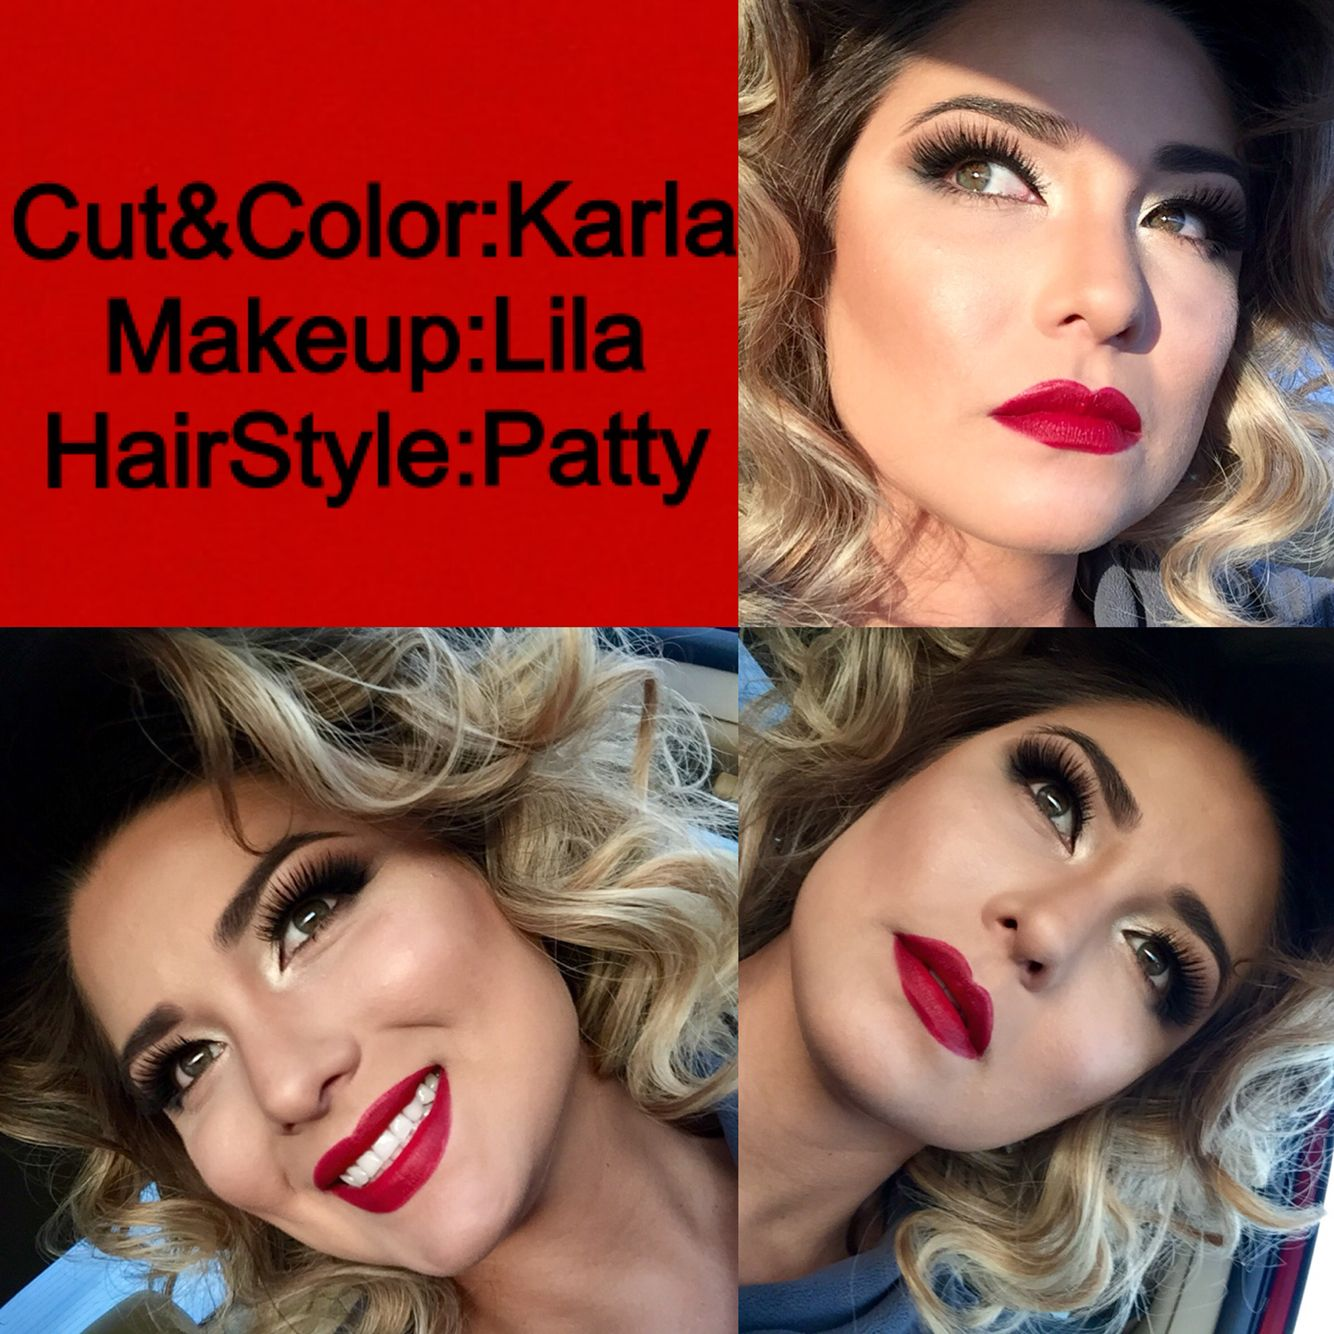 Marilyn Monroe inspired look by The Hair Studio by KC team